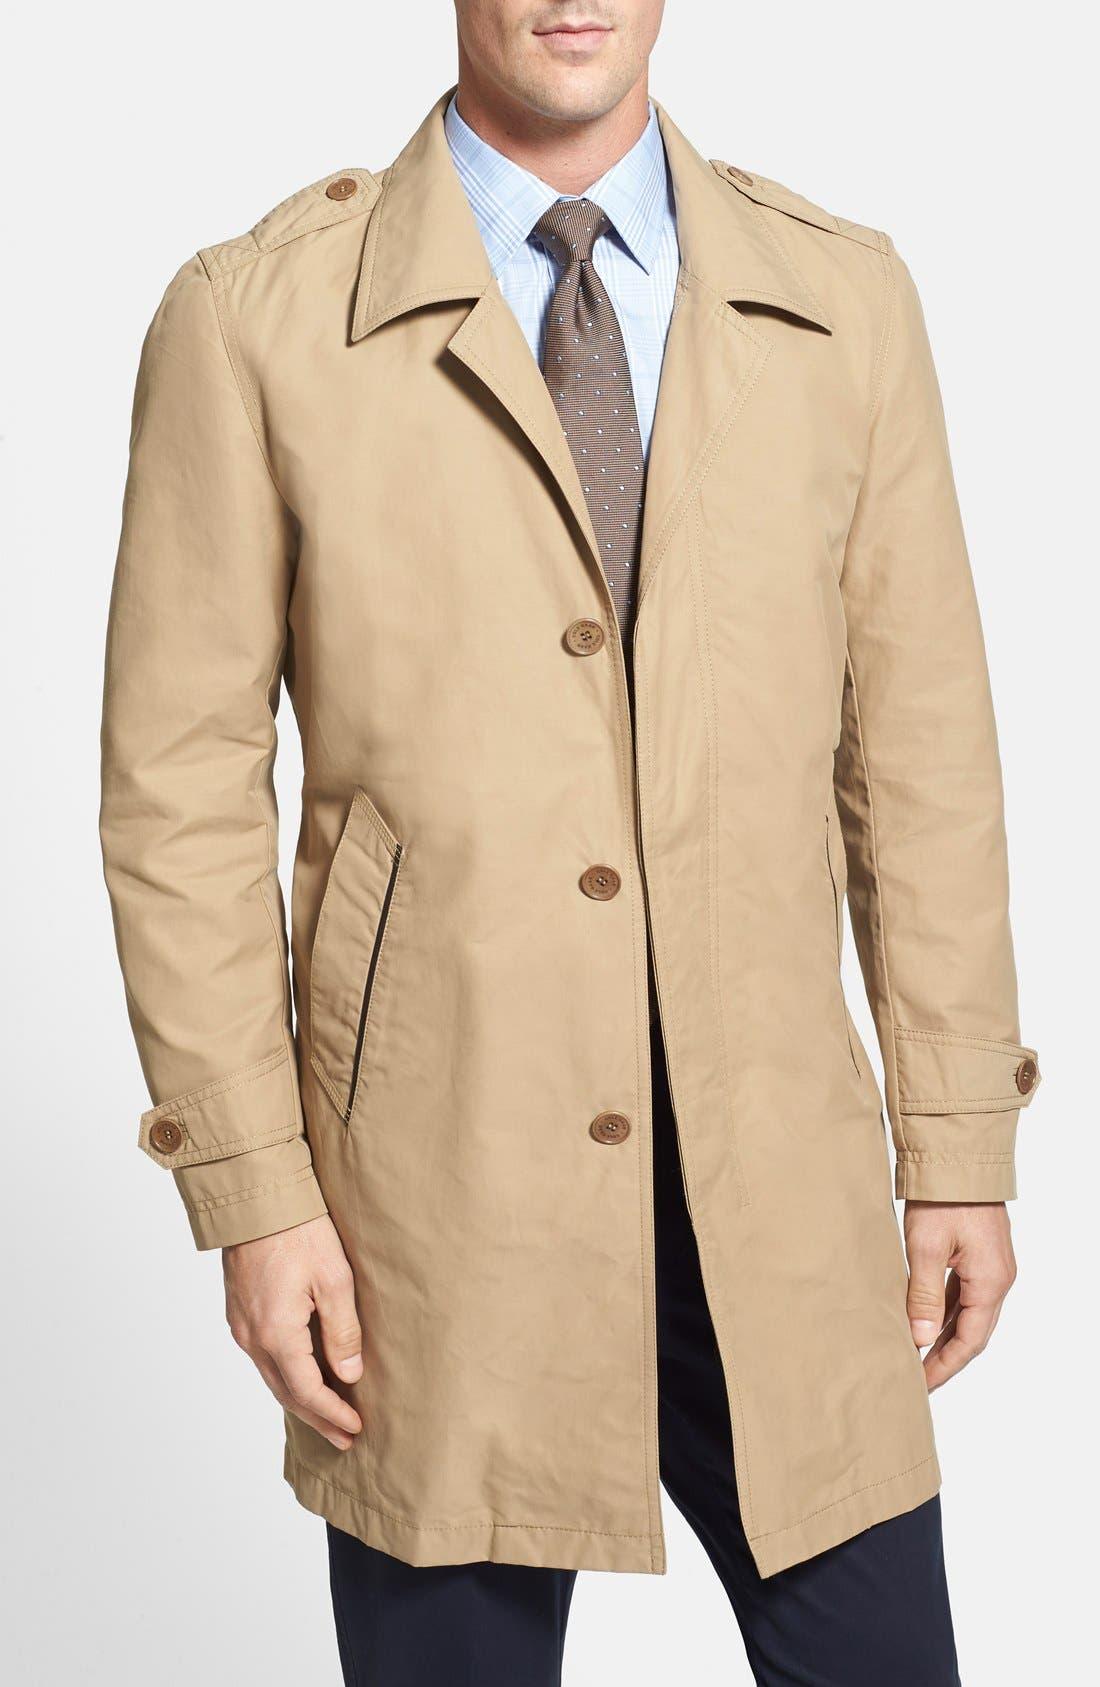 COLE HAAN,                             Cotton Blend Twill Car Coat,                             Main thumbnail 1, color,                             258